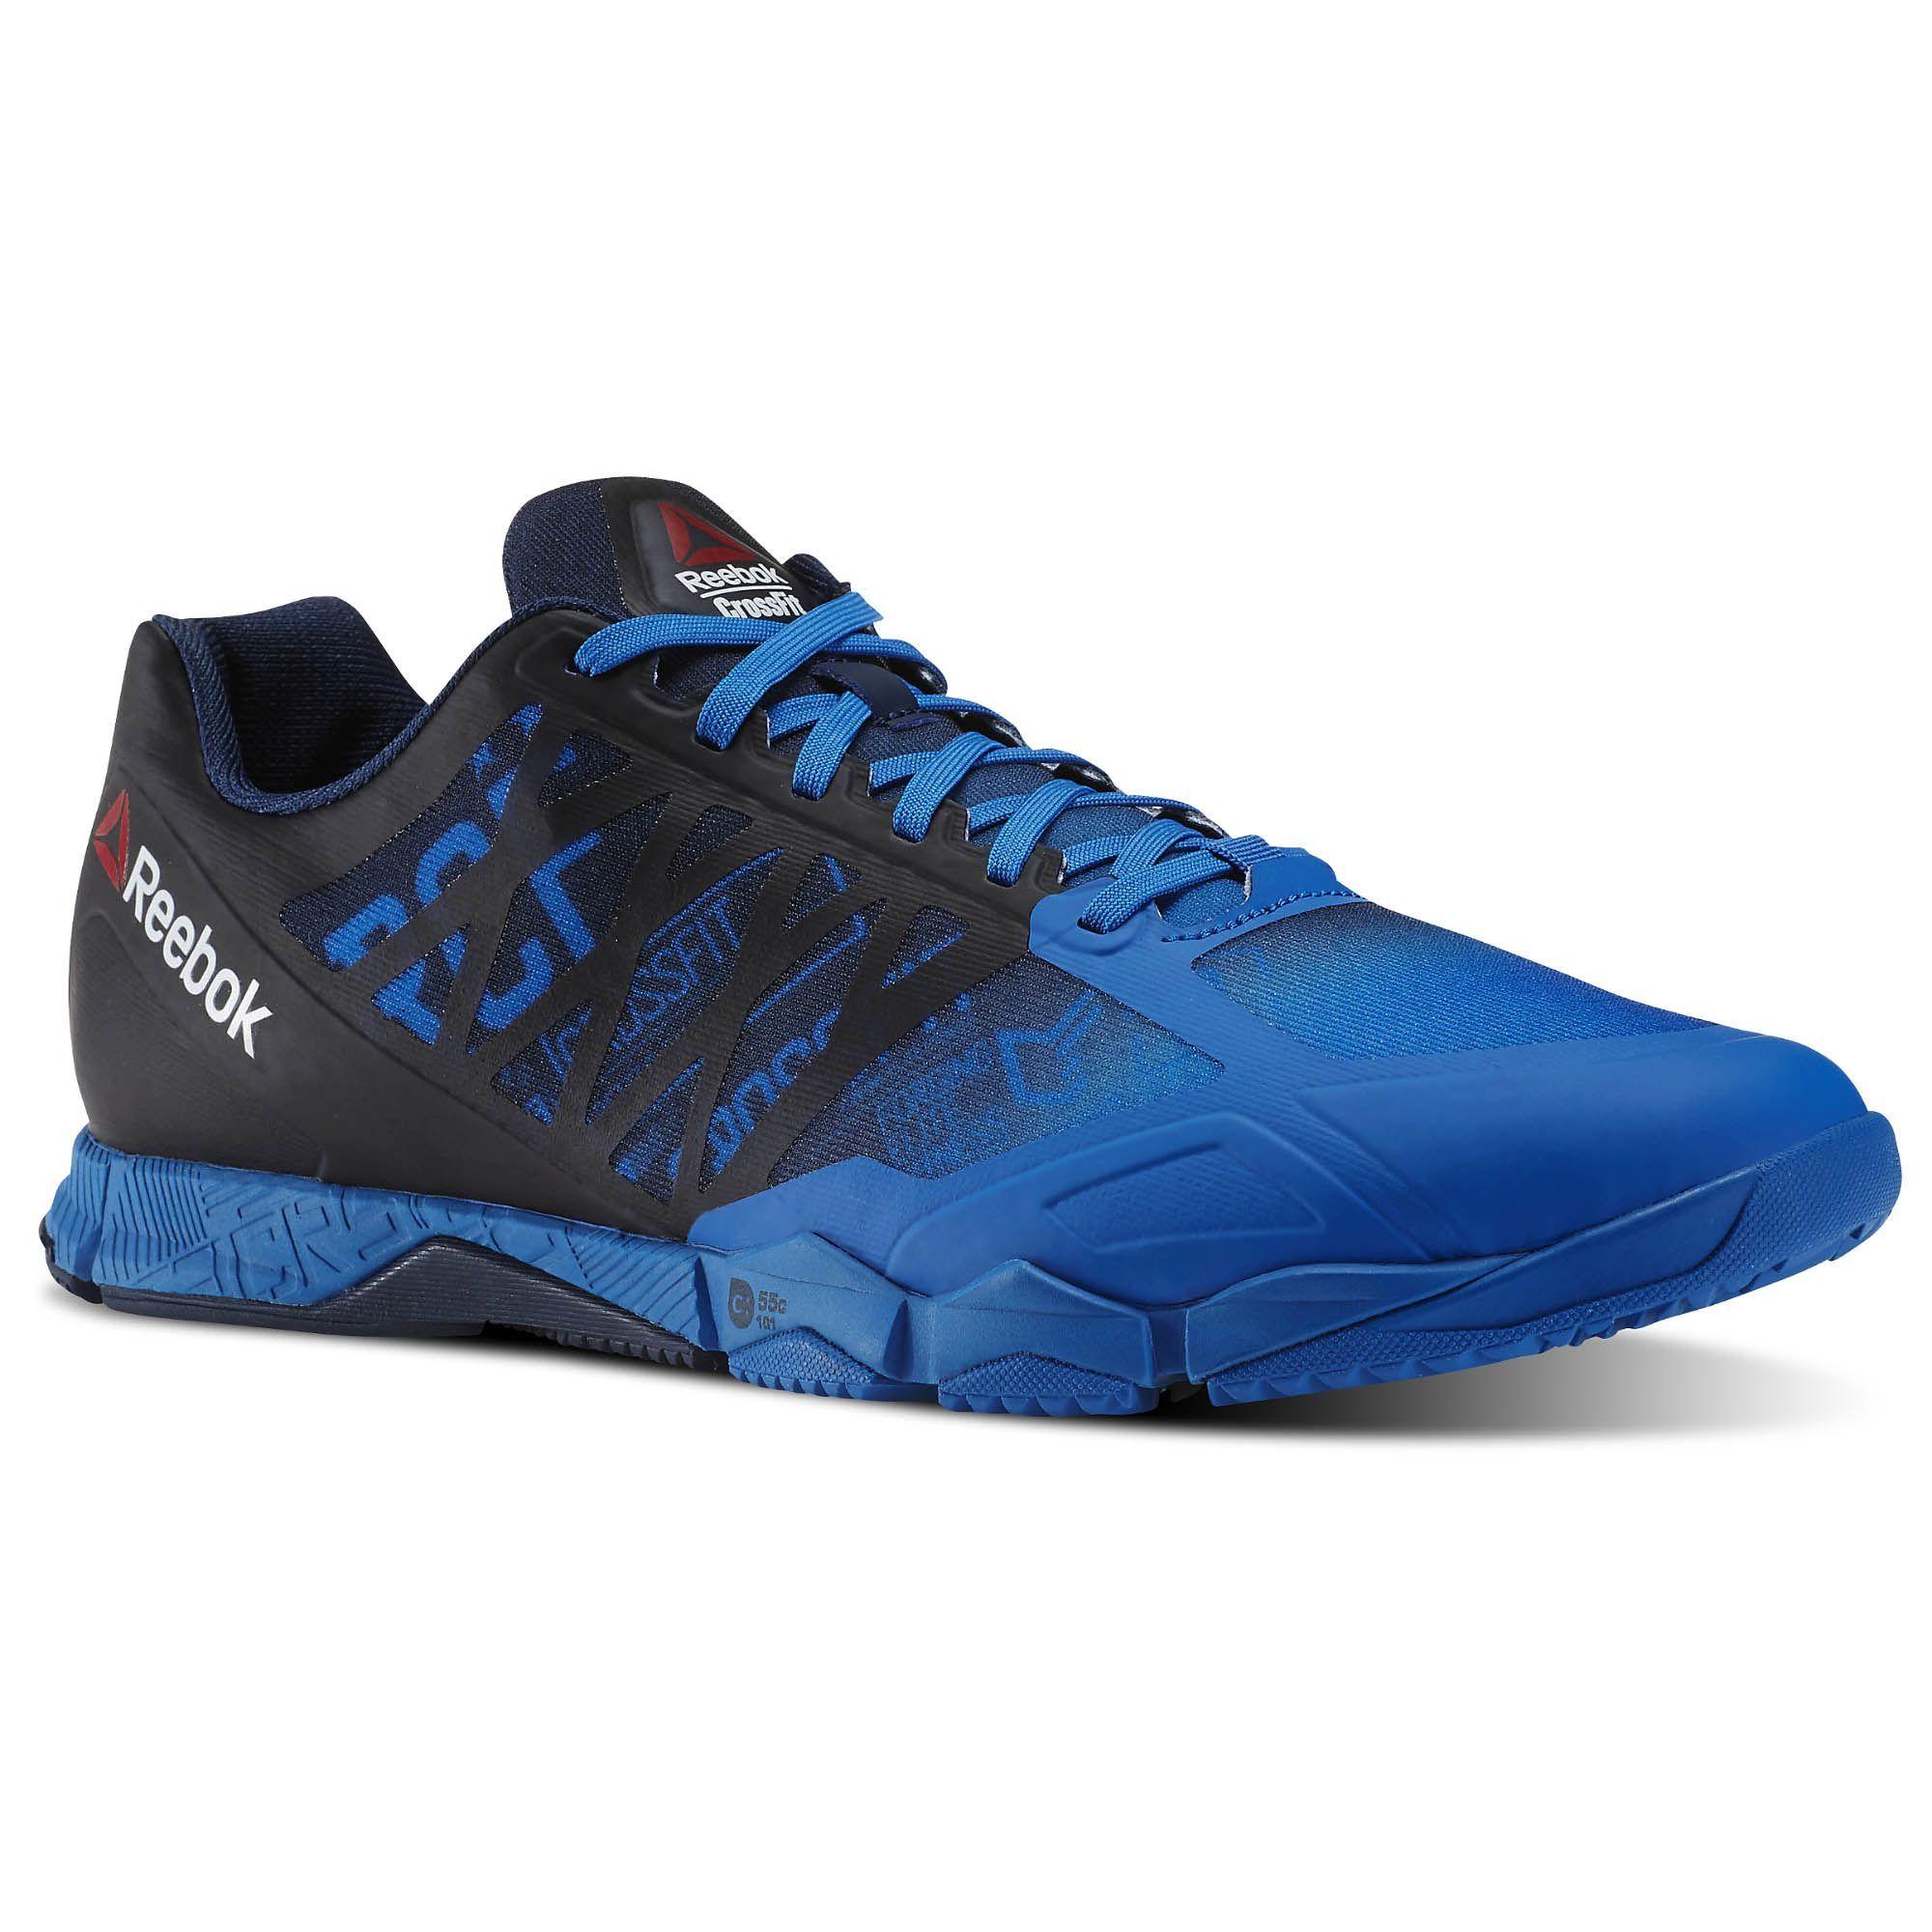 new styles eb038 e2ef8 Reebok - Reebok CrossFit Speed TR Tenis, Relojes, Ropa De Crossfit,  Levantamiento De